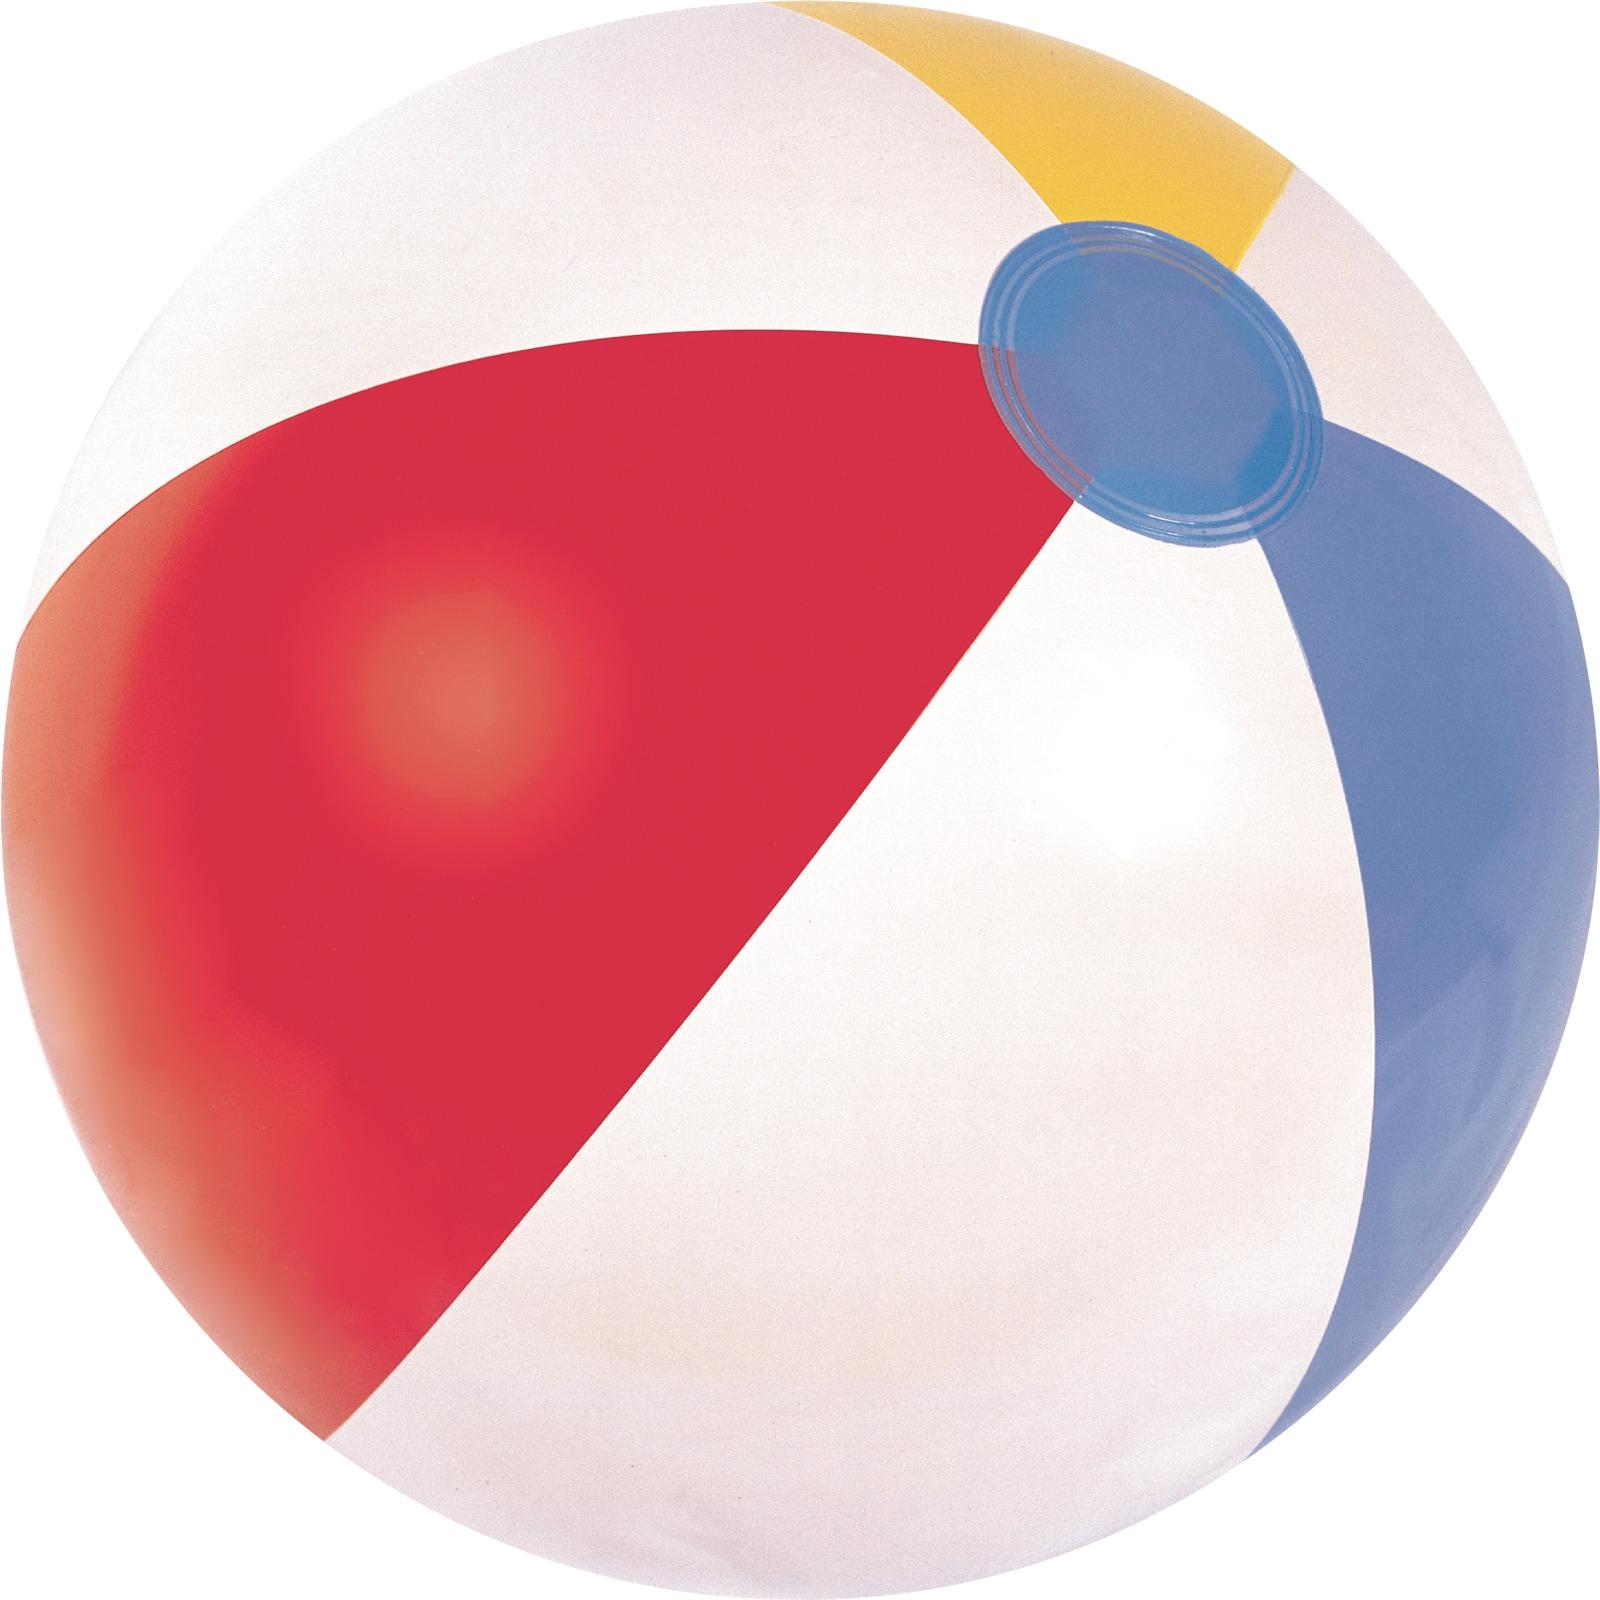 Фото - Мяч детский Bestway, диаметр 61 см боди детский luvable friends 60325 f бирюзовый р 55 61